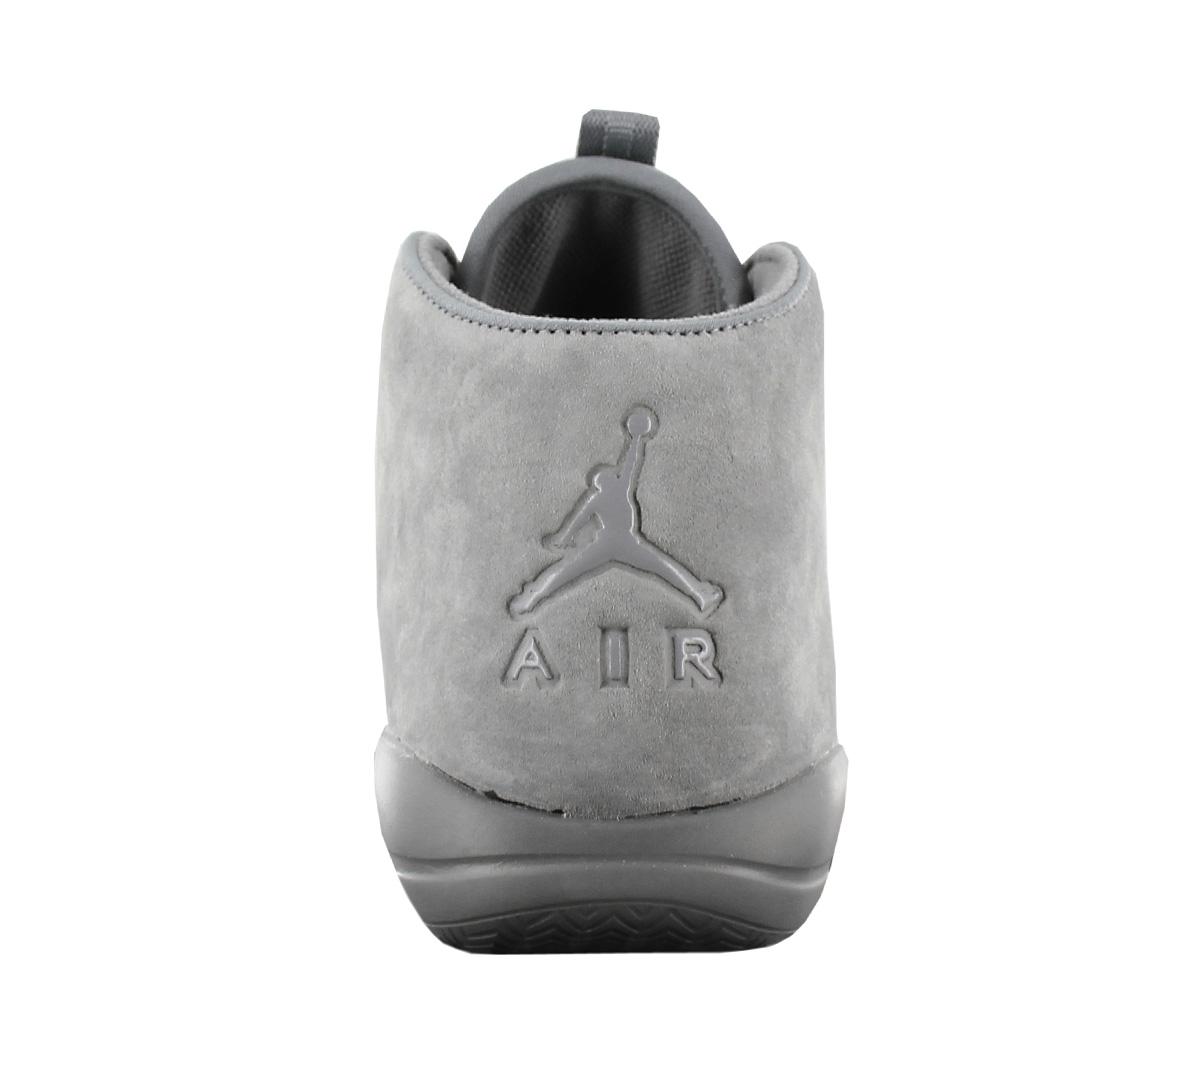 5511f699e795f3 Nike Air Jordan Eclipse Chukka Leather Men s Sneakers Shoe Sneaker ...